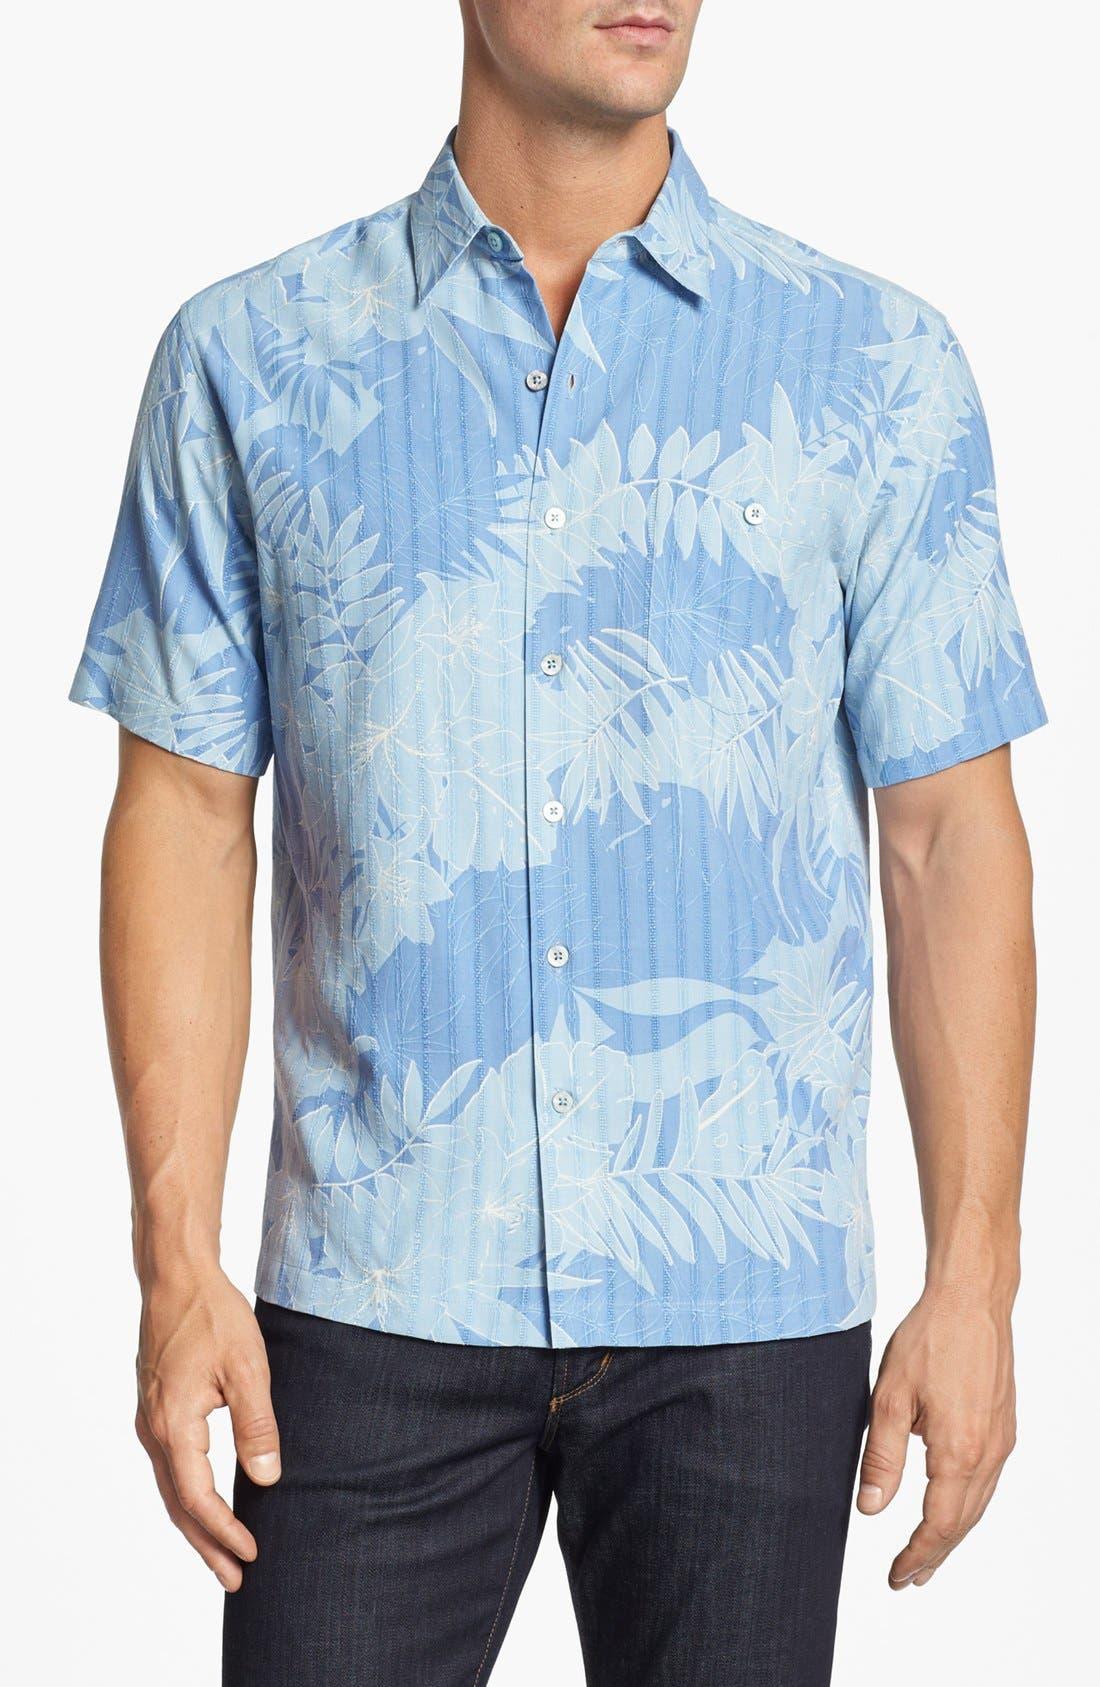 Alternate Image 1 Selected - Tori Richard 'Reflection' Short Sleeve Sport Shirt